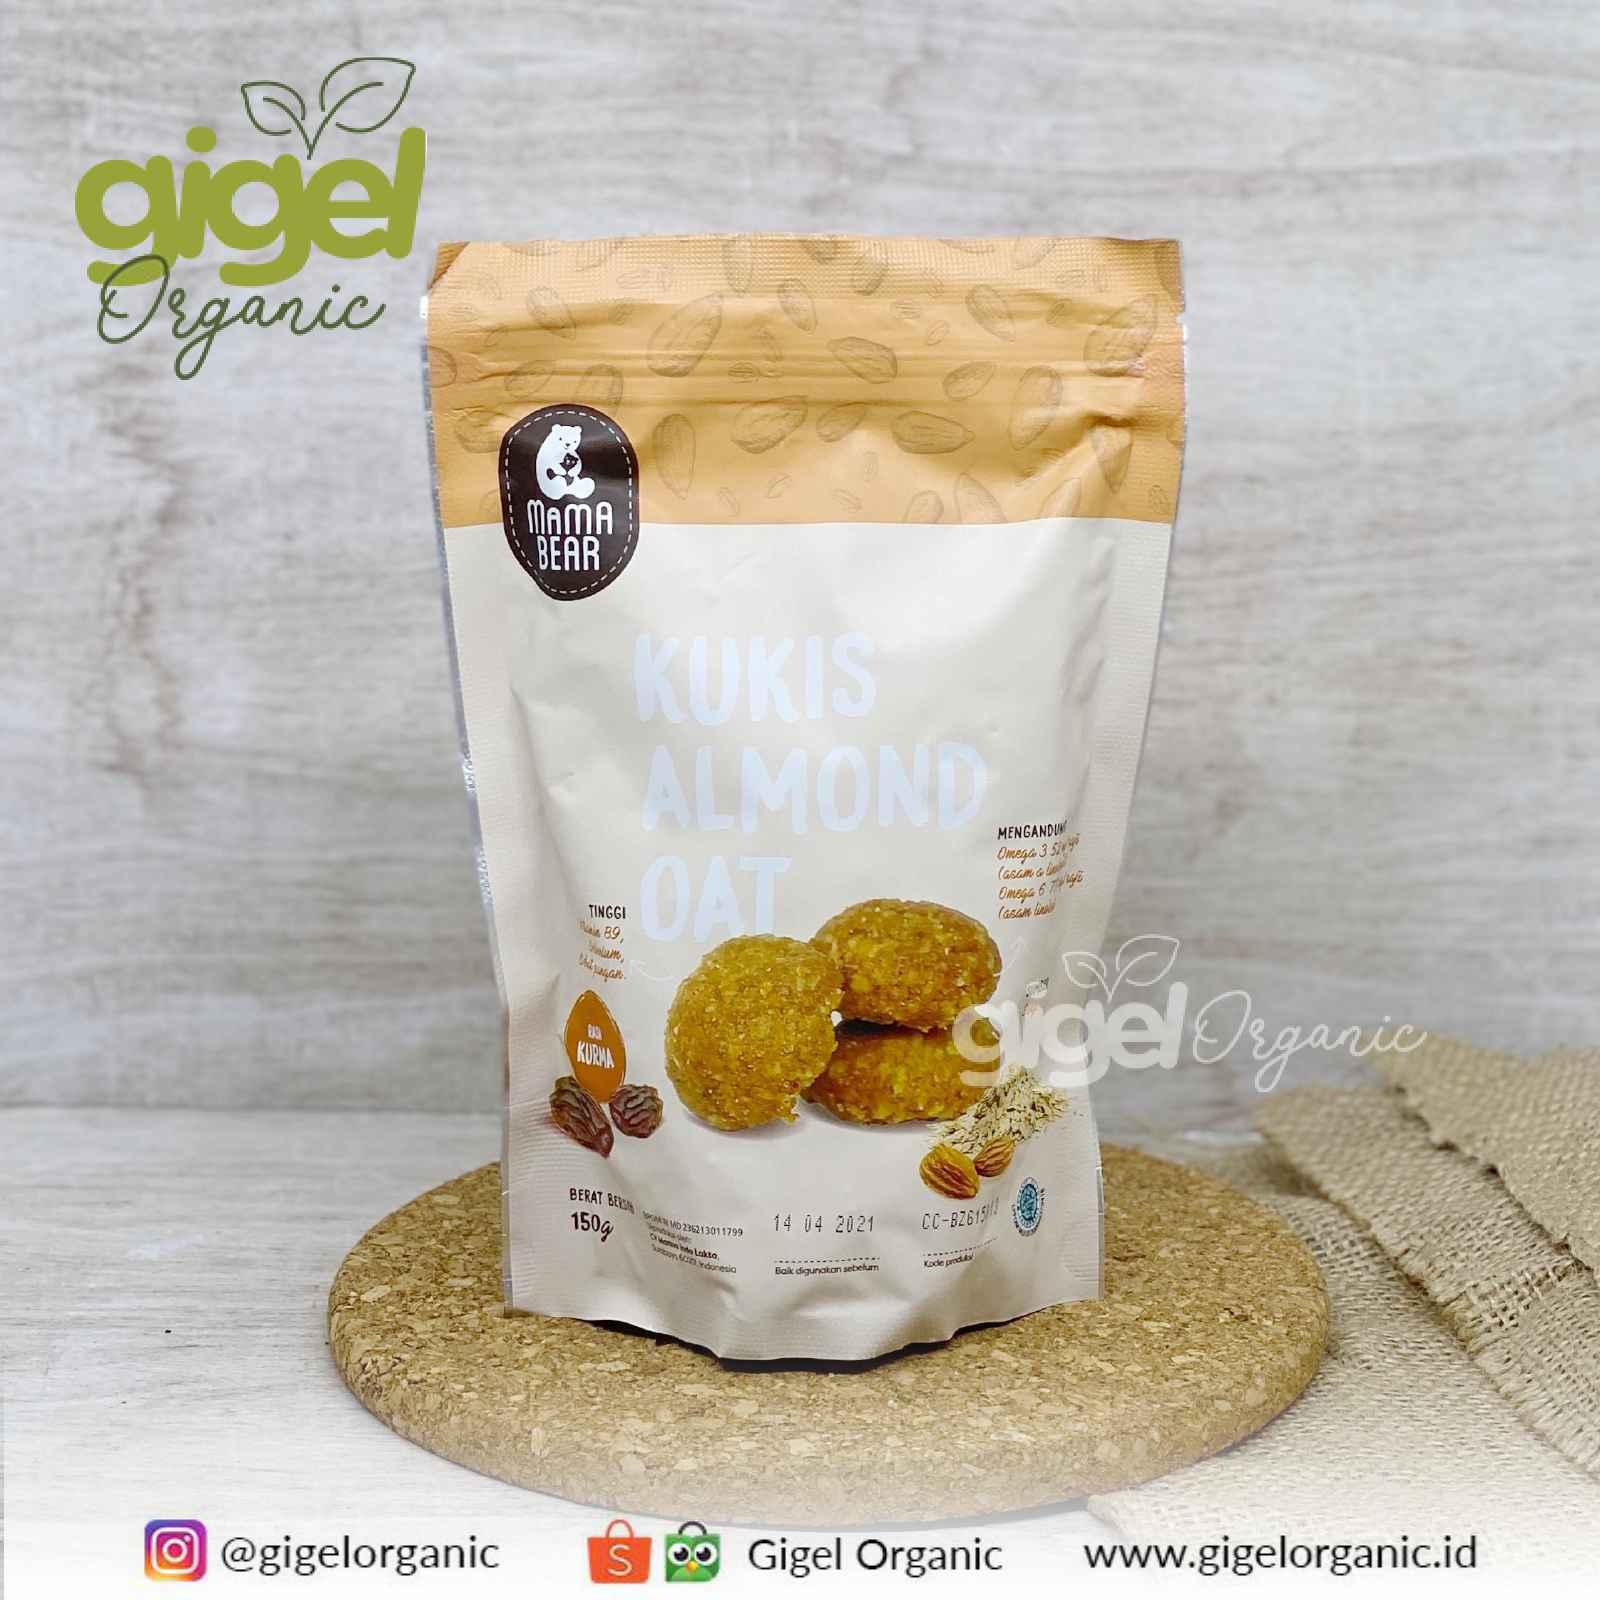 Jual Mama Bear ASI Booster Kukis Almond Oat Kurma Gigel Organic